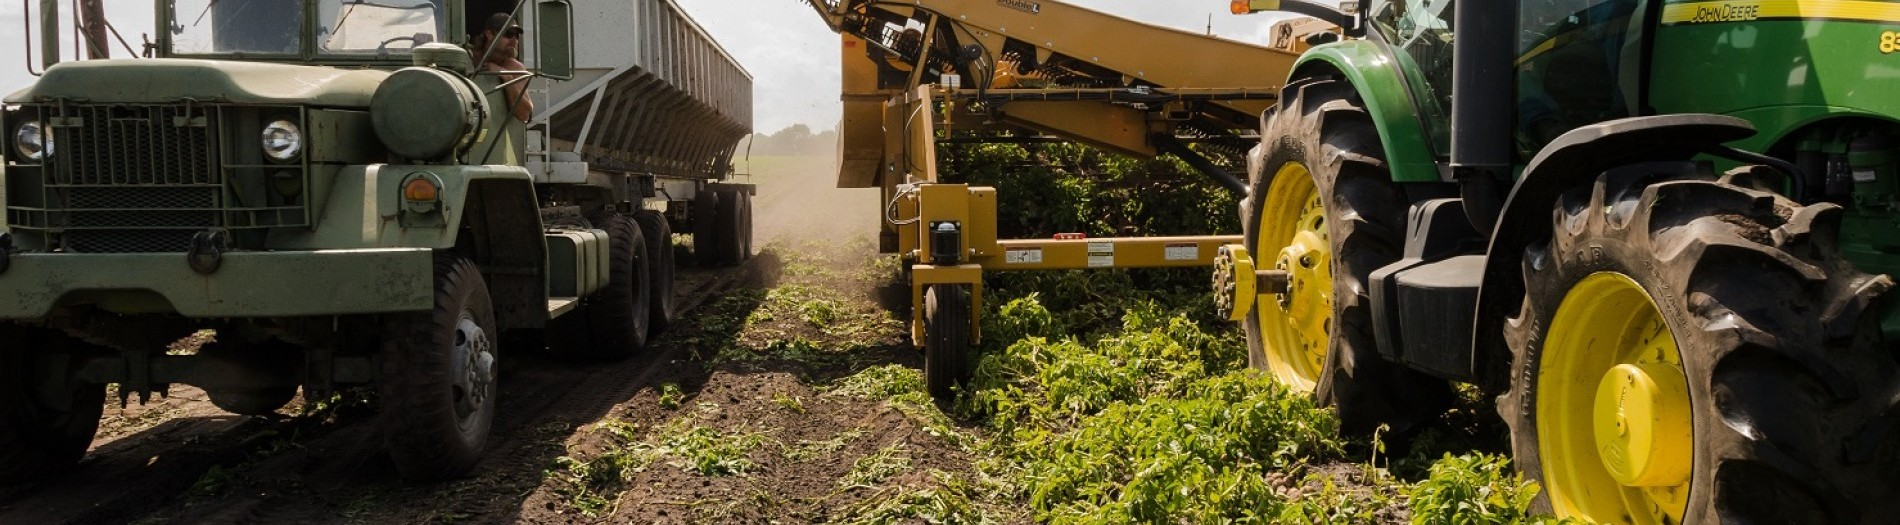 The Regenerative Agriculture Revolution